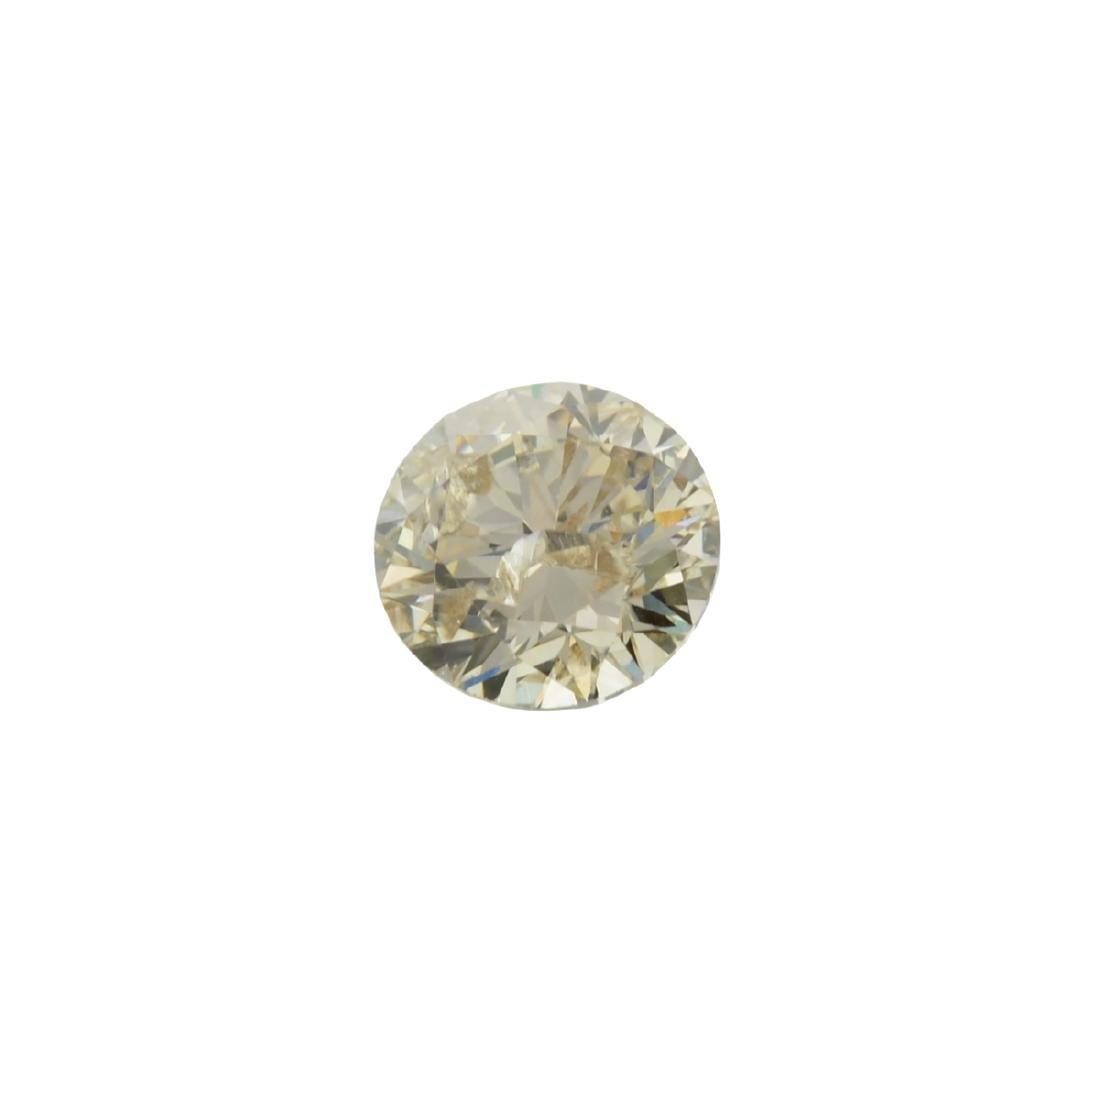 Fine Jewelry GIA Certified 0.70CT Brilliant Round Cut